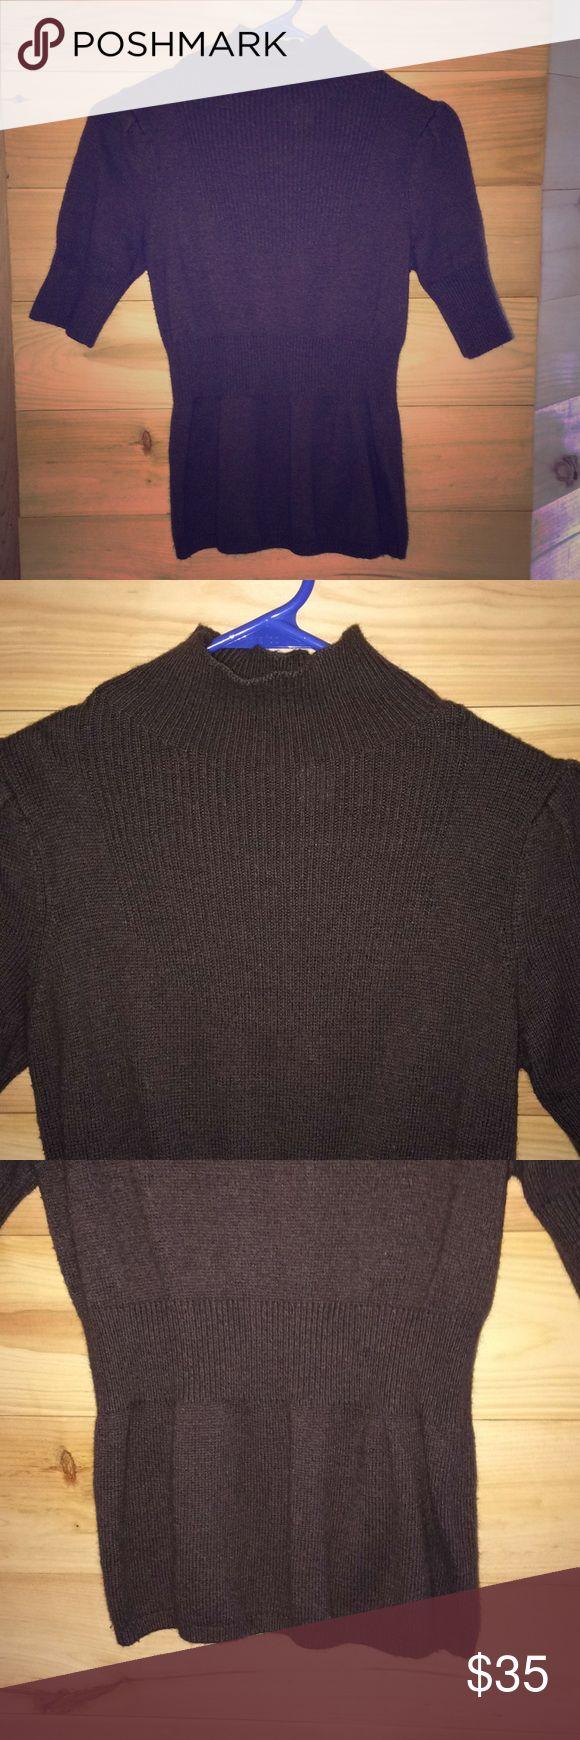 Anthropologie Moth short sleeve sweater XS Brown MOTH Rayon/Nylon/Cotton/Angora blend.  Very soft, warm, comfortable.  Pre-loved. MOTH Sweaters Cowl & Turtlenecks